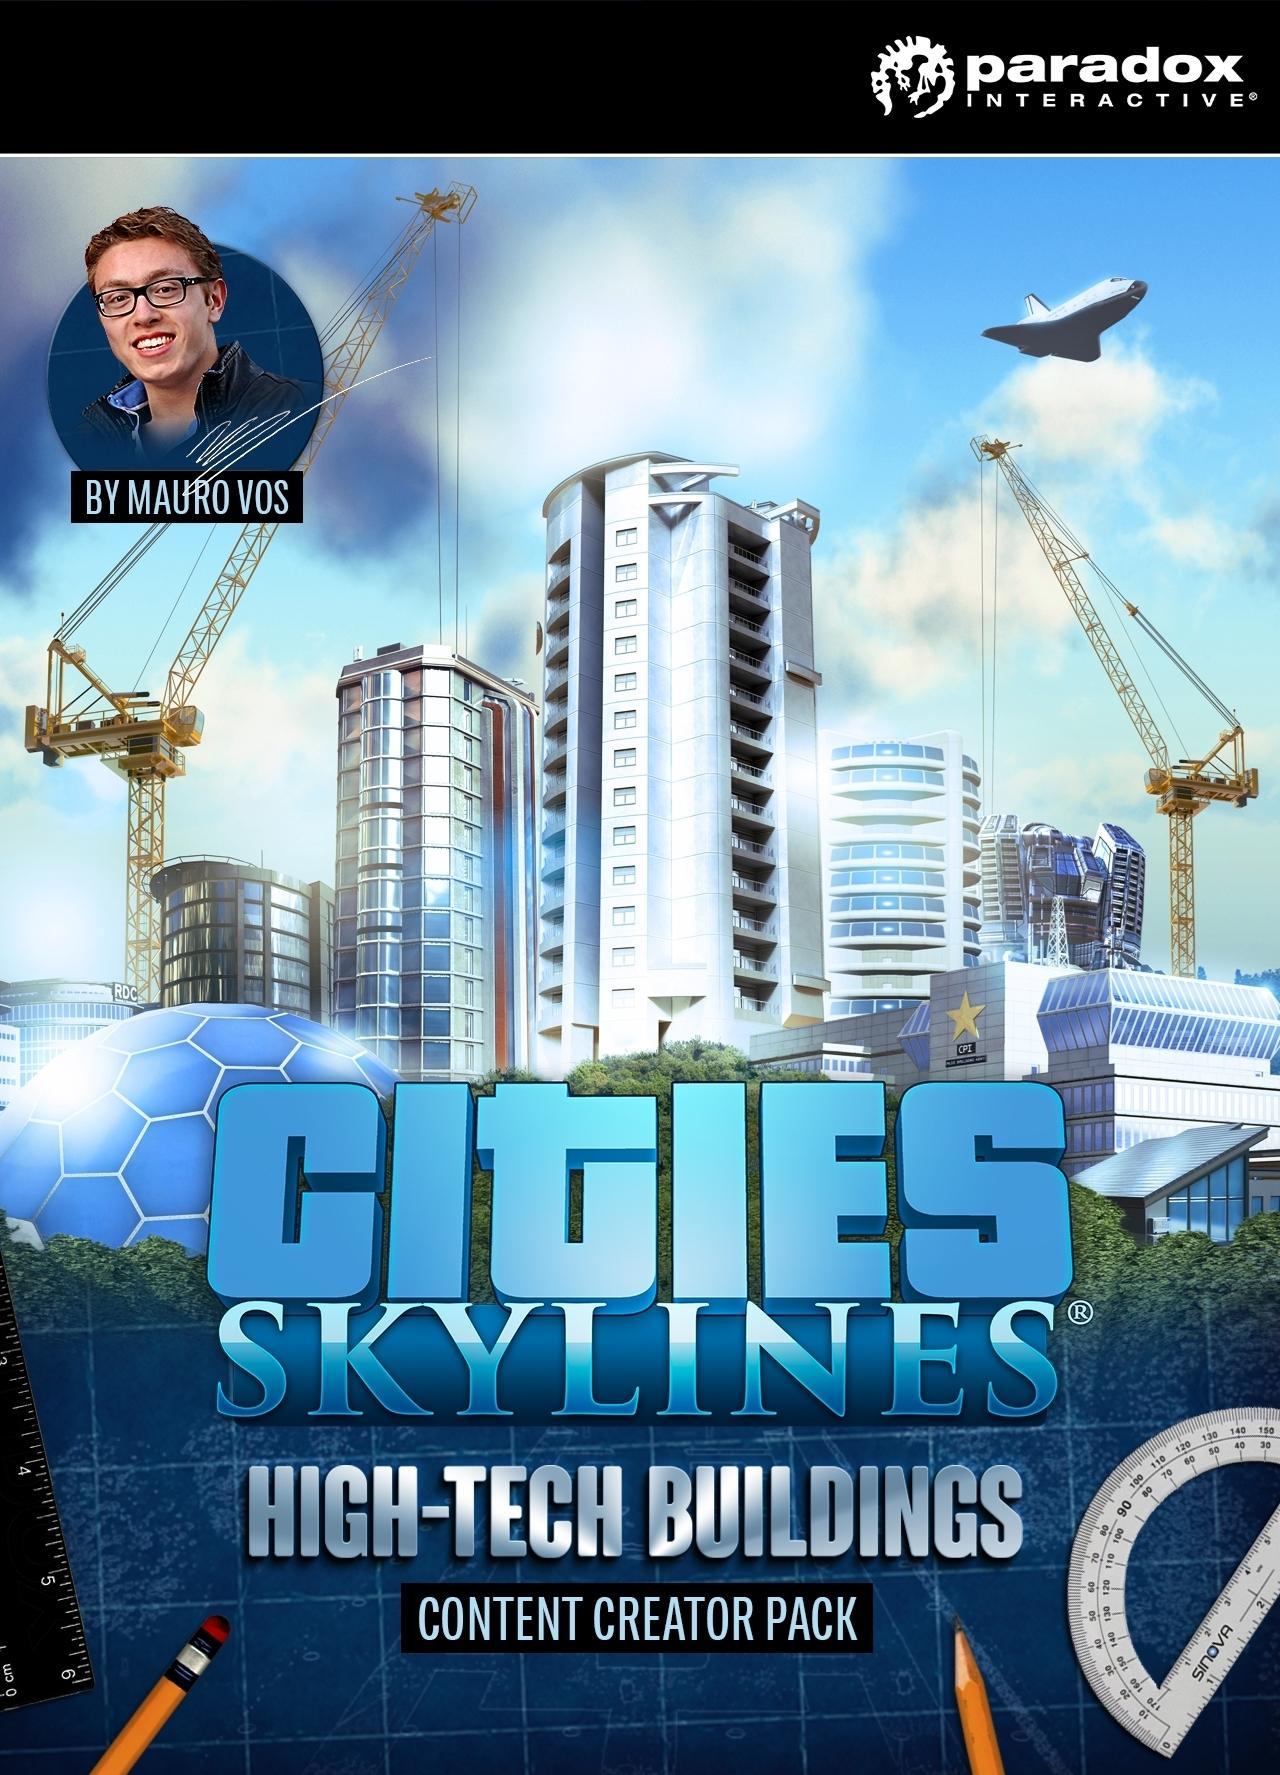 Cities: Skylines - Content Creator Pack: High-Tech Buildings (NEW) | LATAM_RU-CIS_TR (adf3d7ce-18fa-40d2-9130-601028cc1e77)